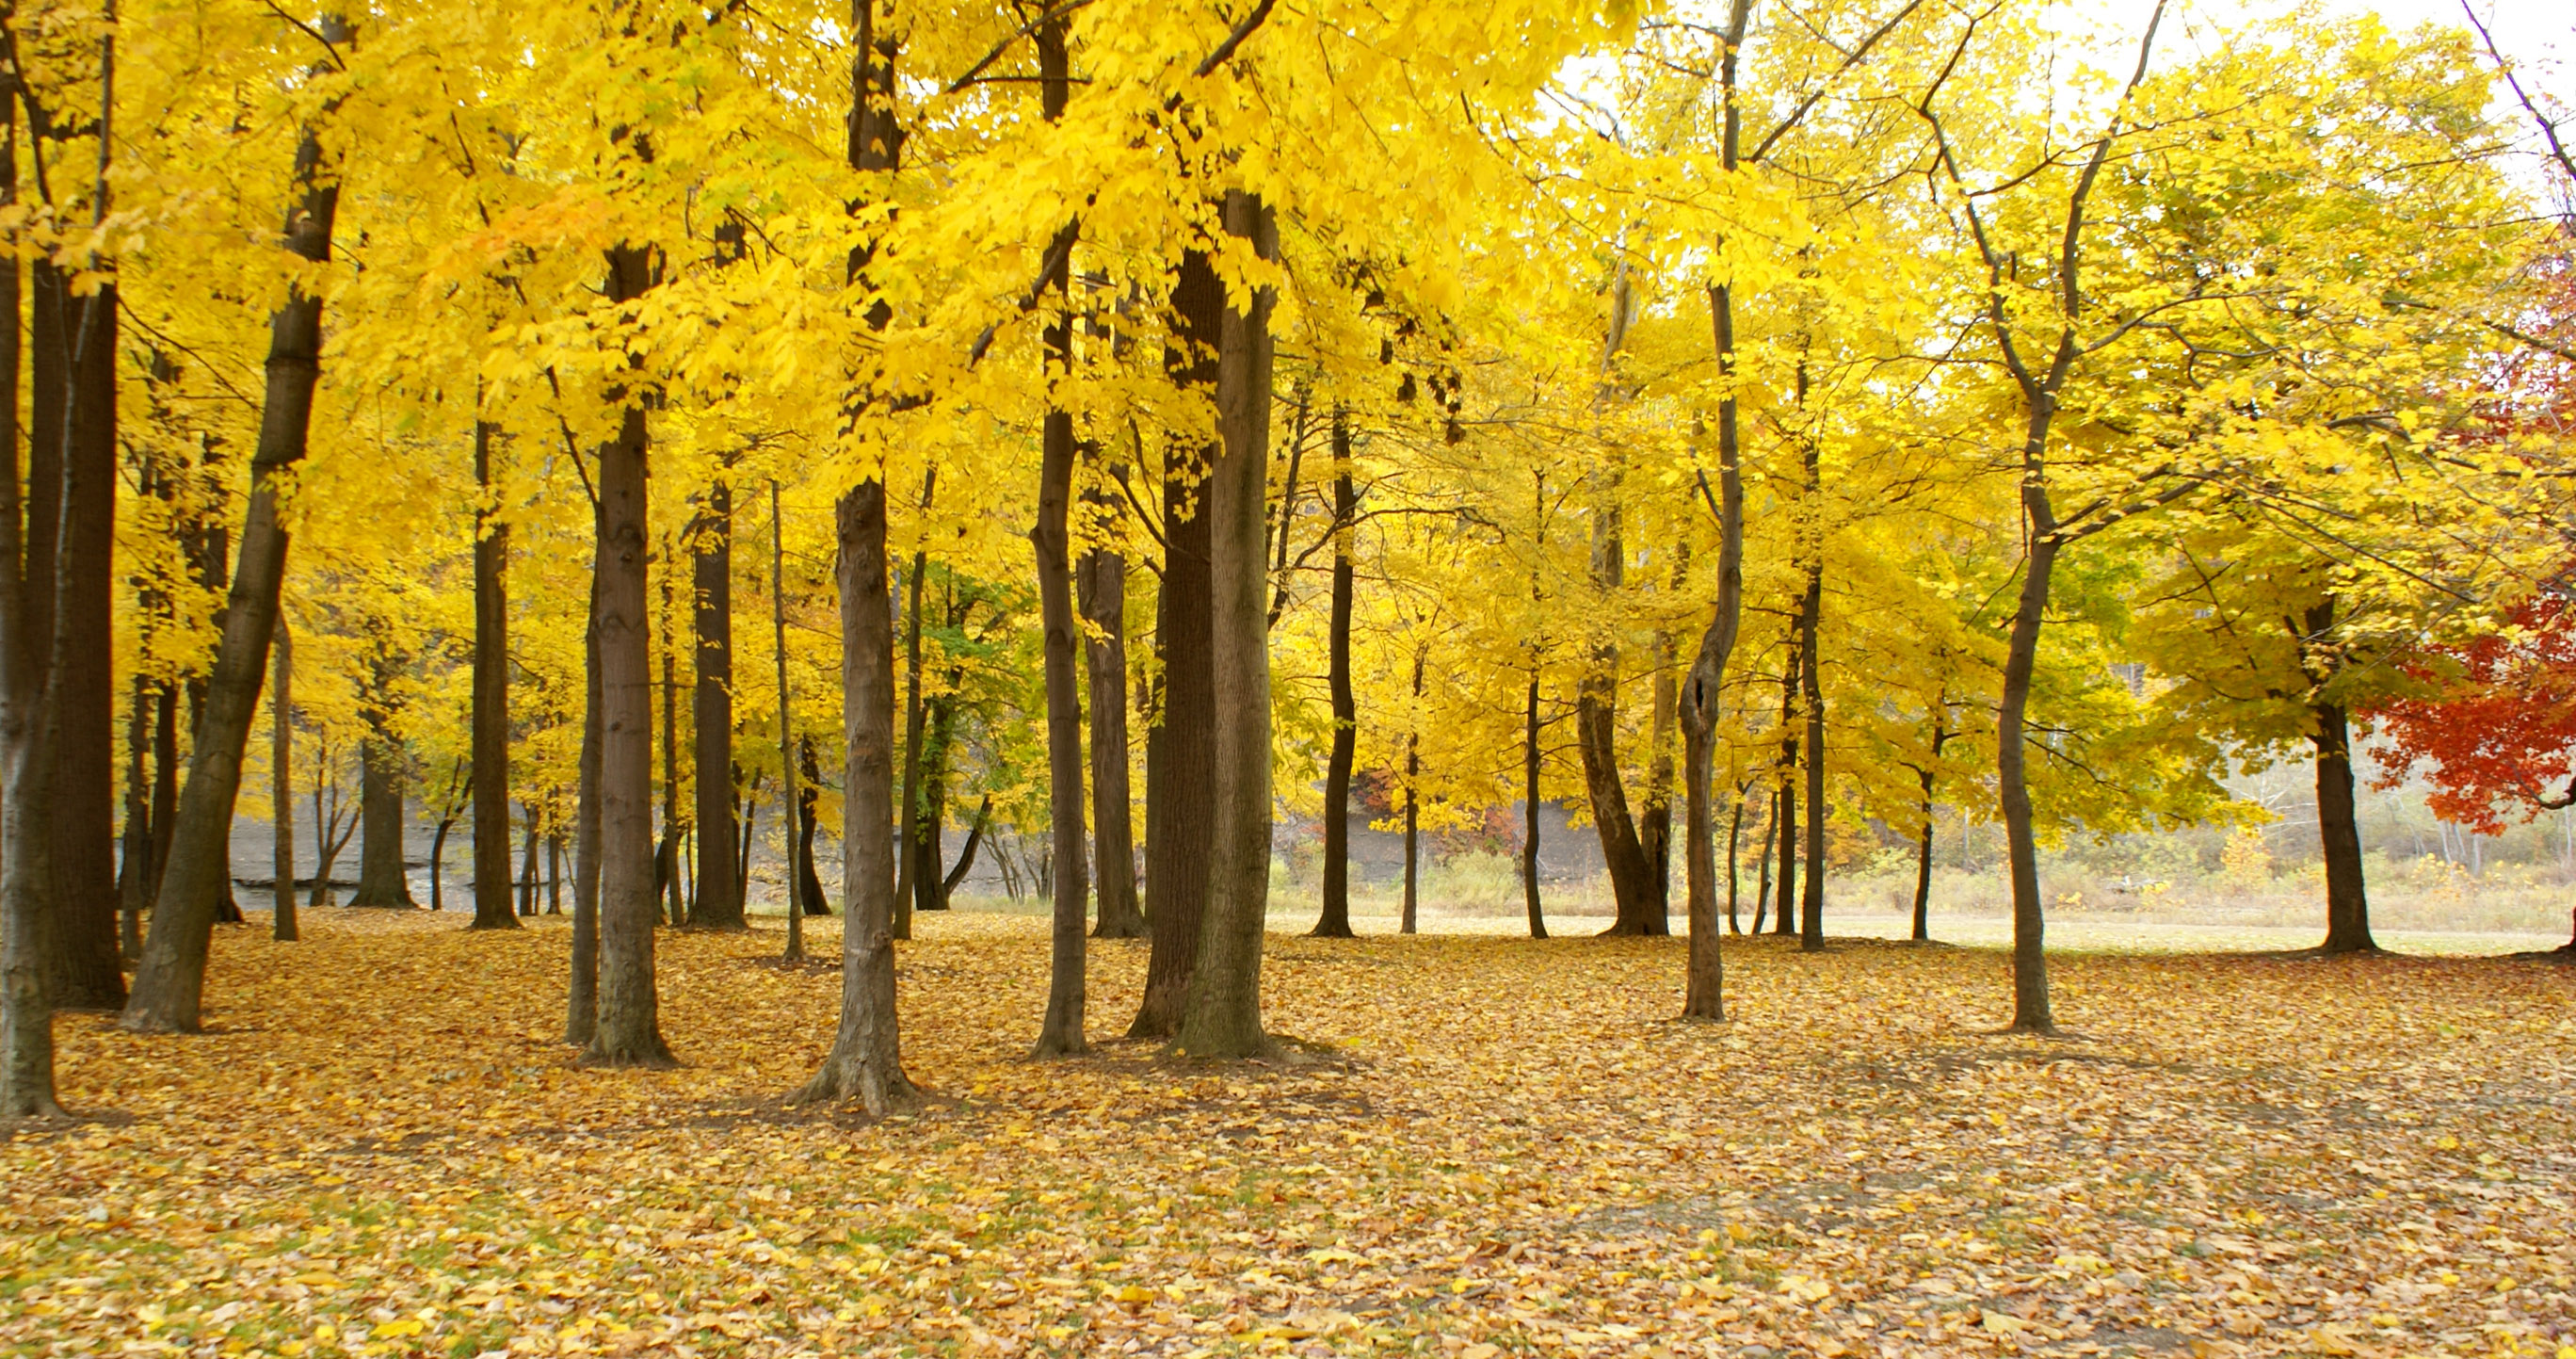 K_Brewer-Yellow of Autumn by the Smolen Bridge